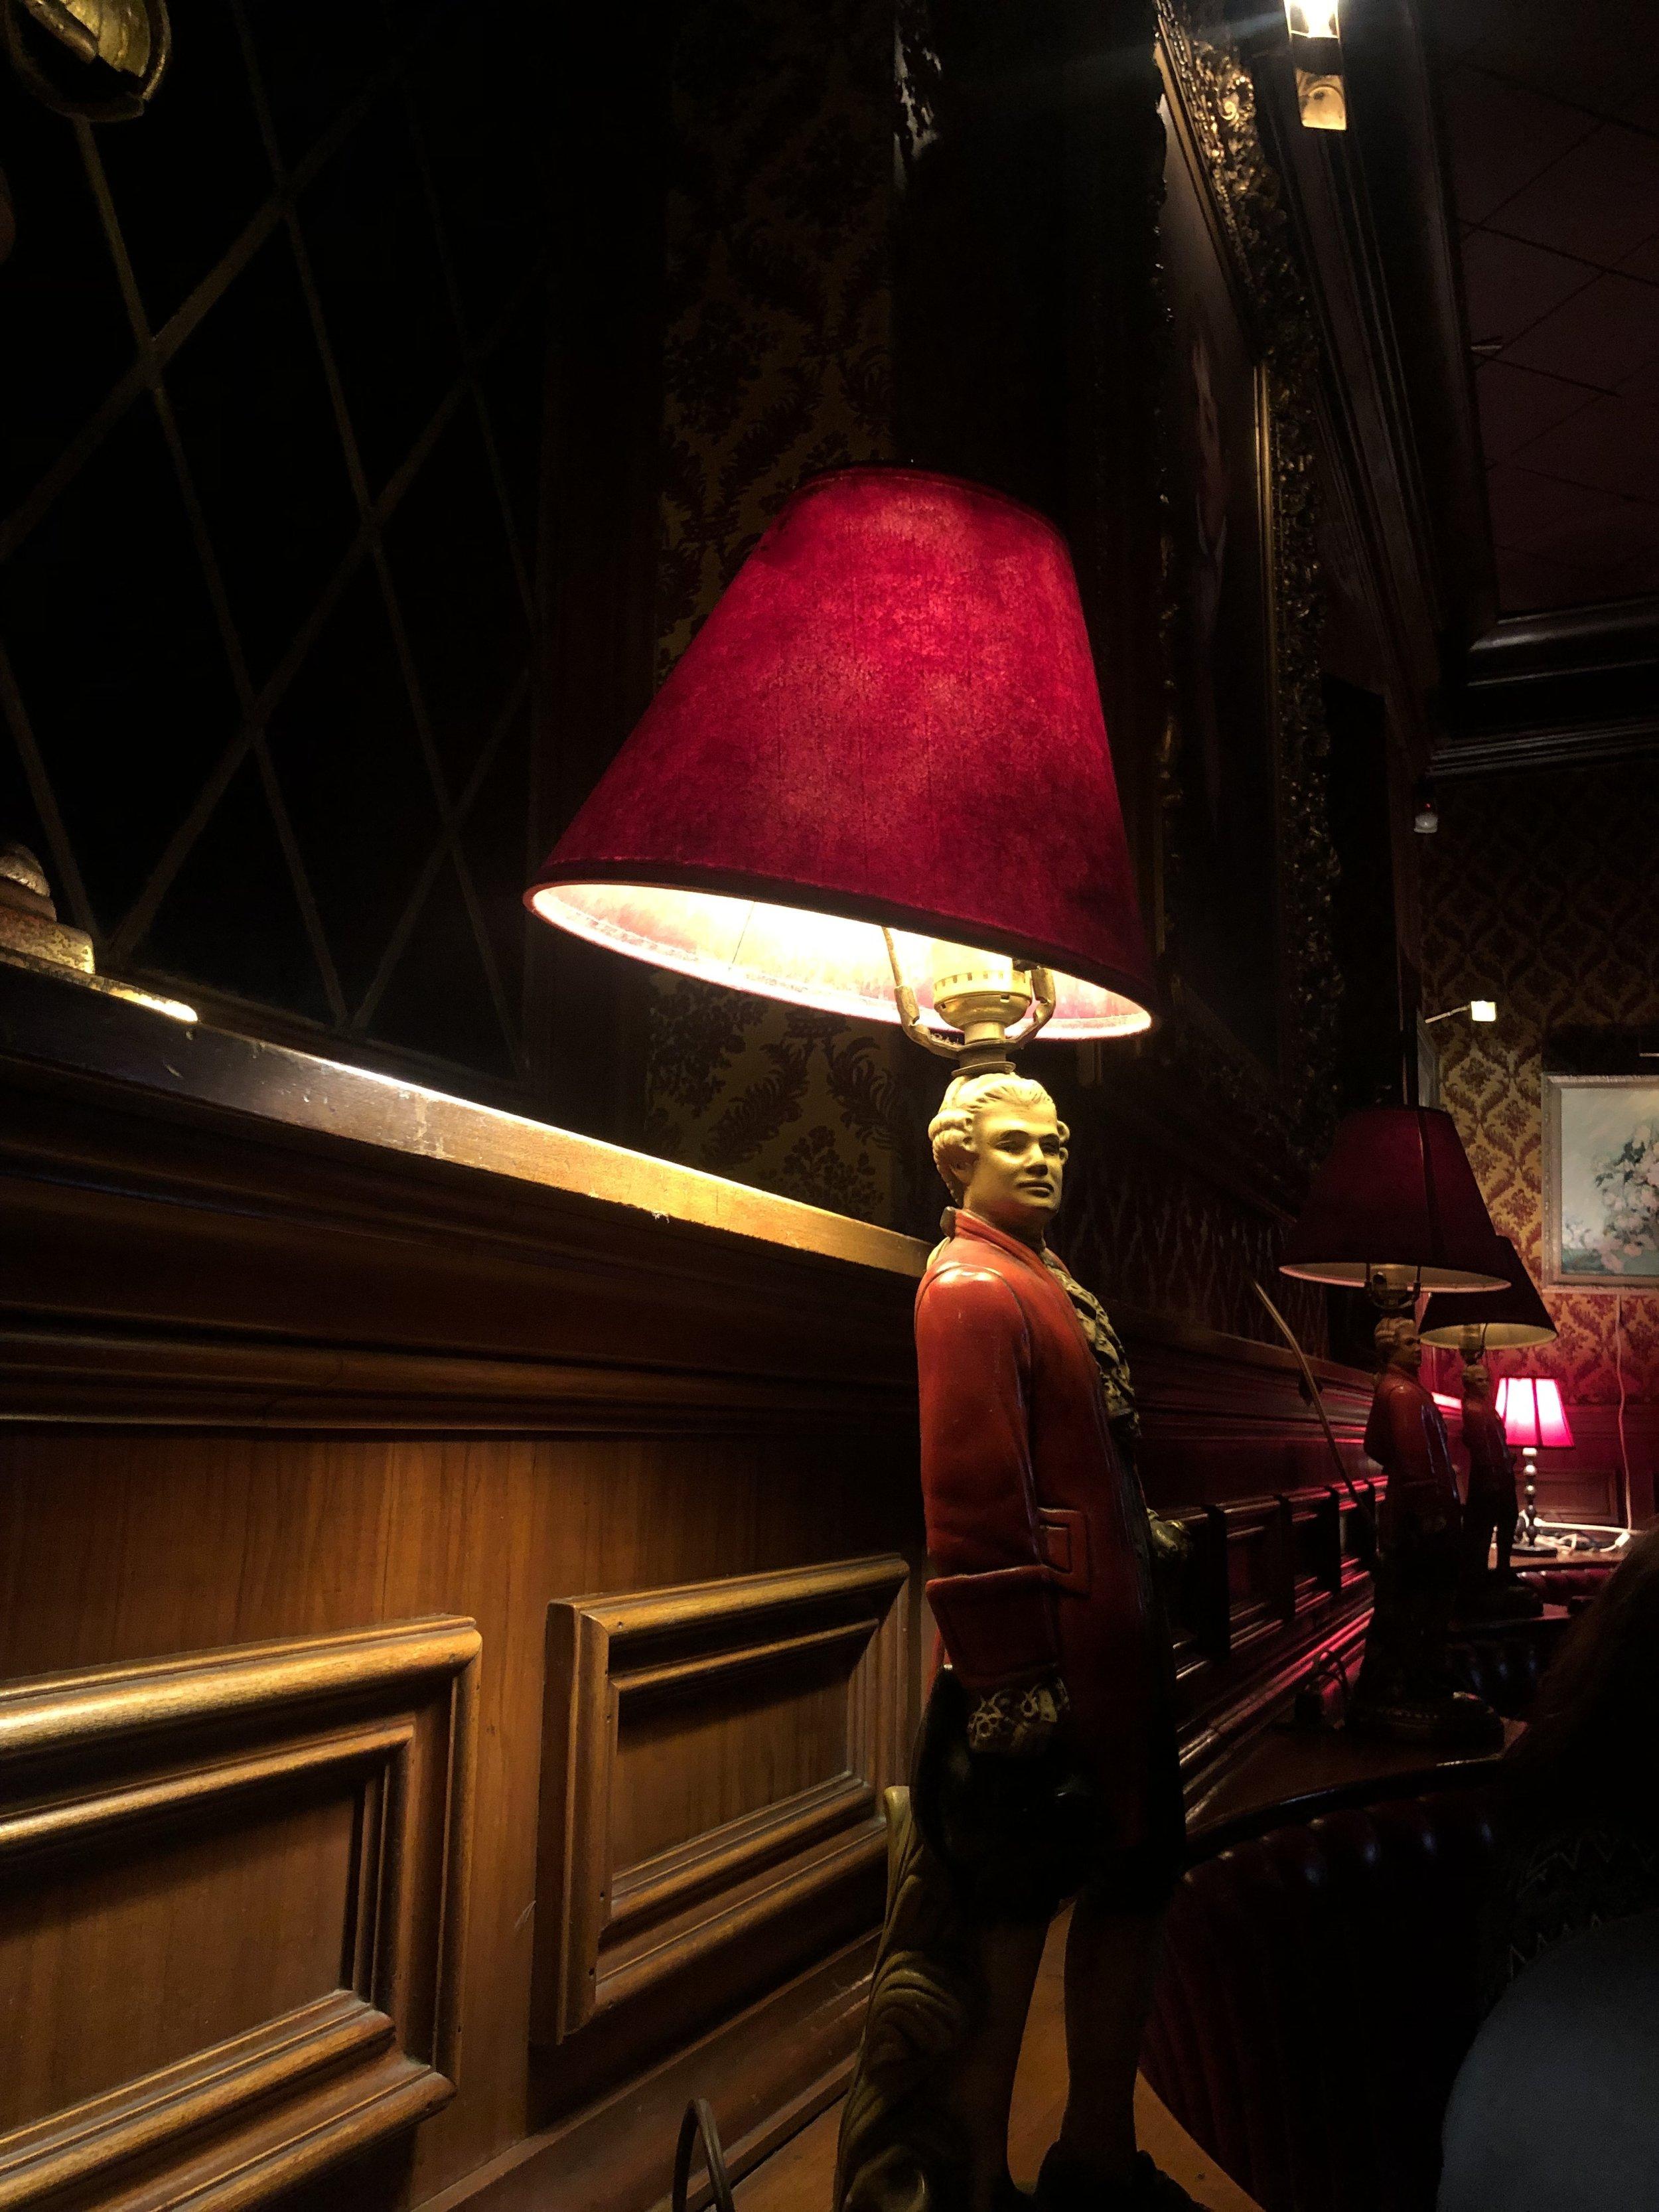 Prince Lamp